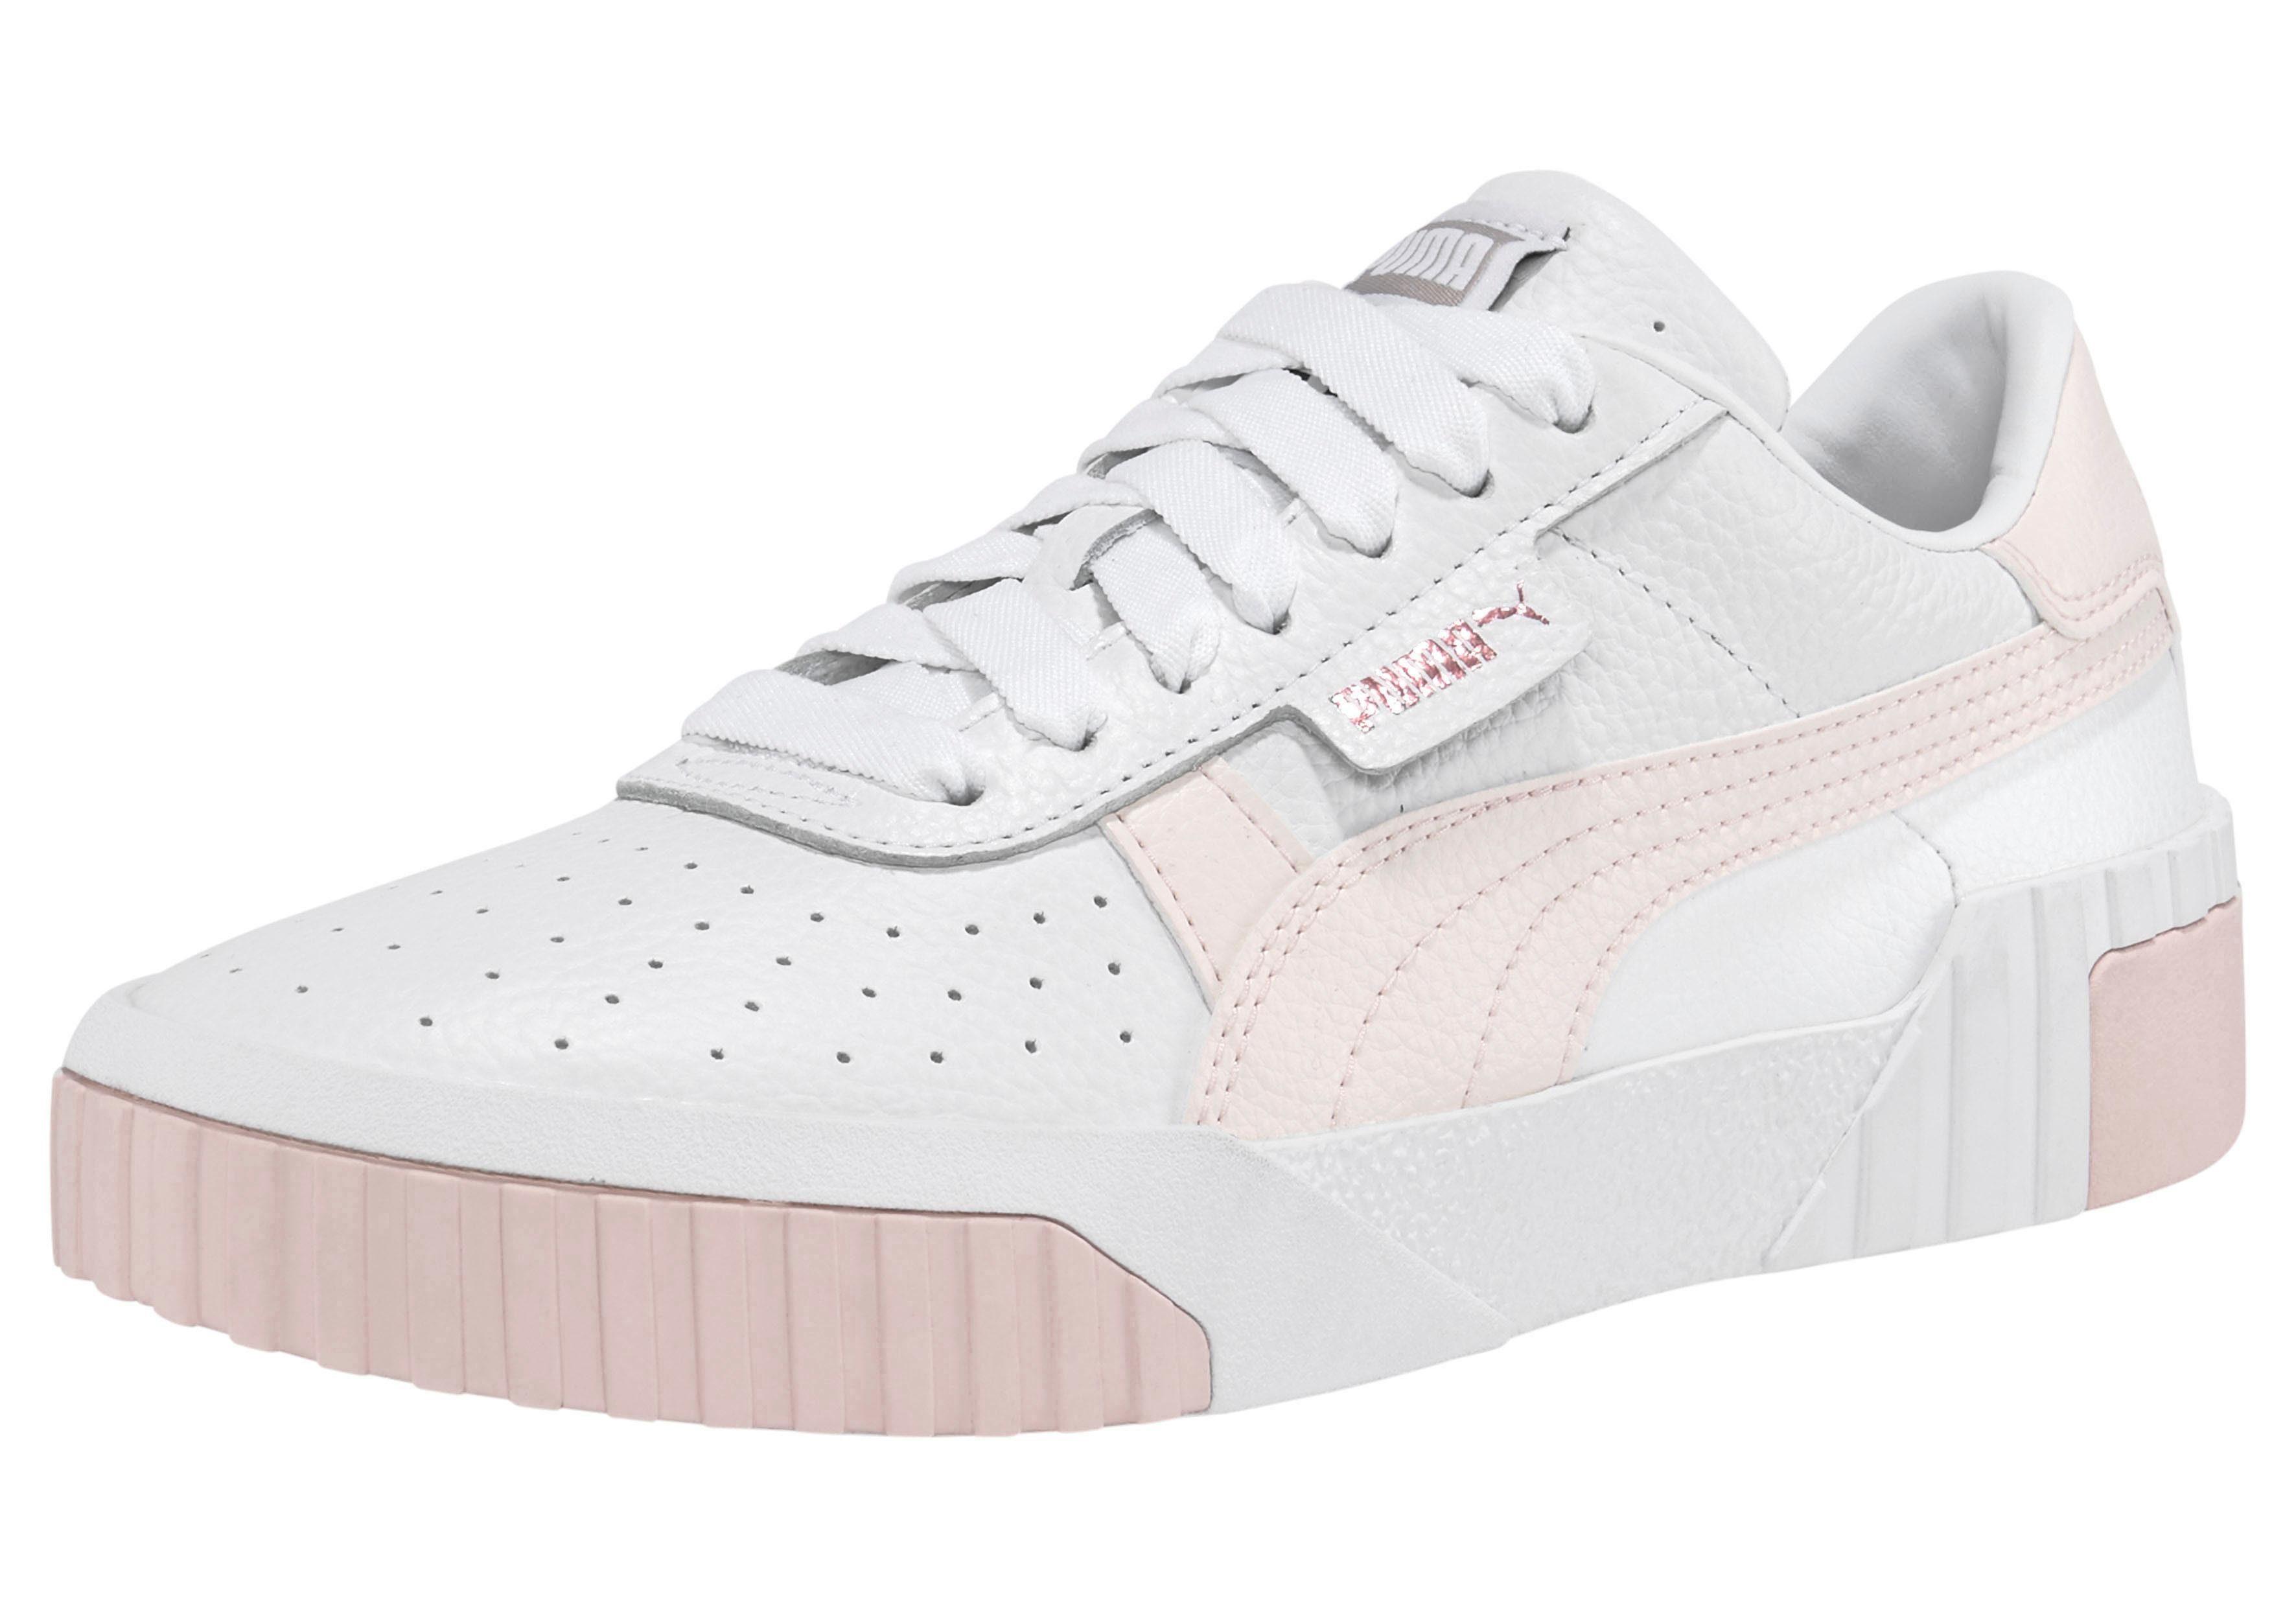 PUMA »Cali Wn's« Sneaker, Modischer Sneaker von PUMA online